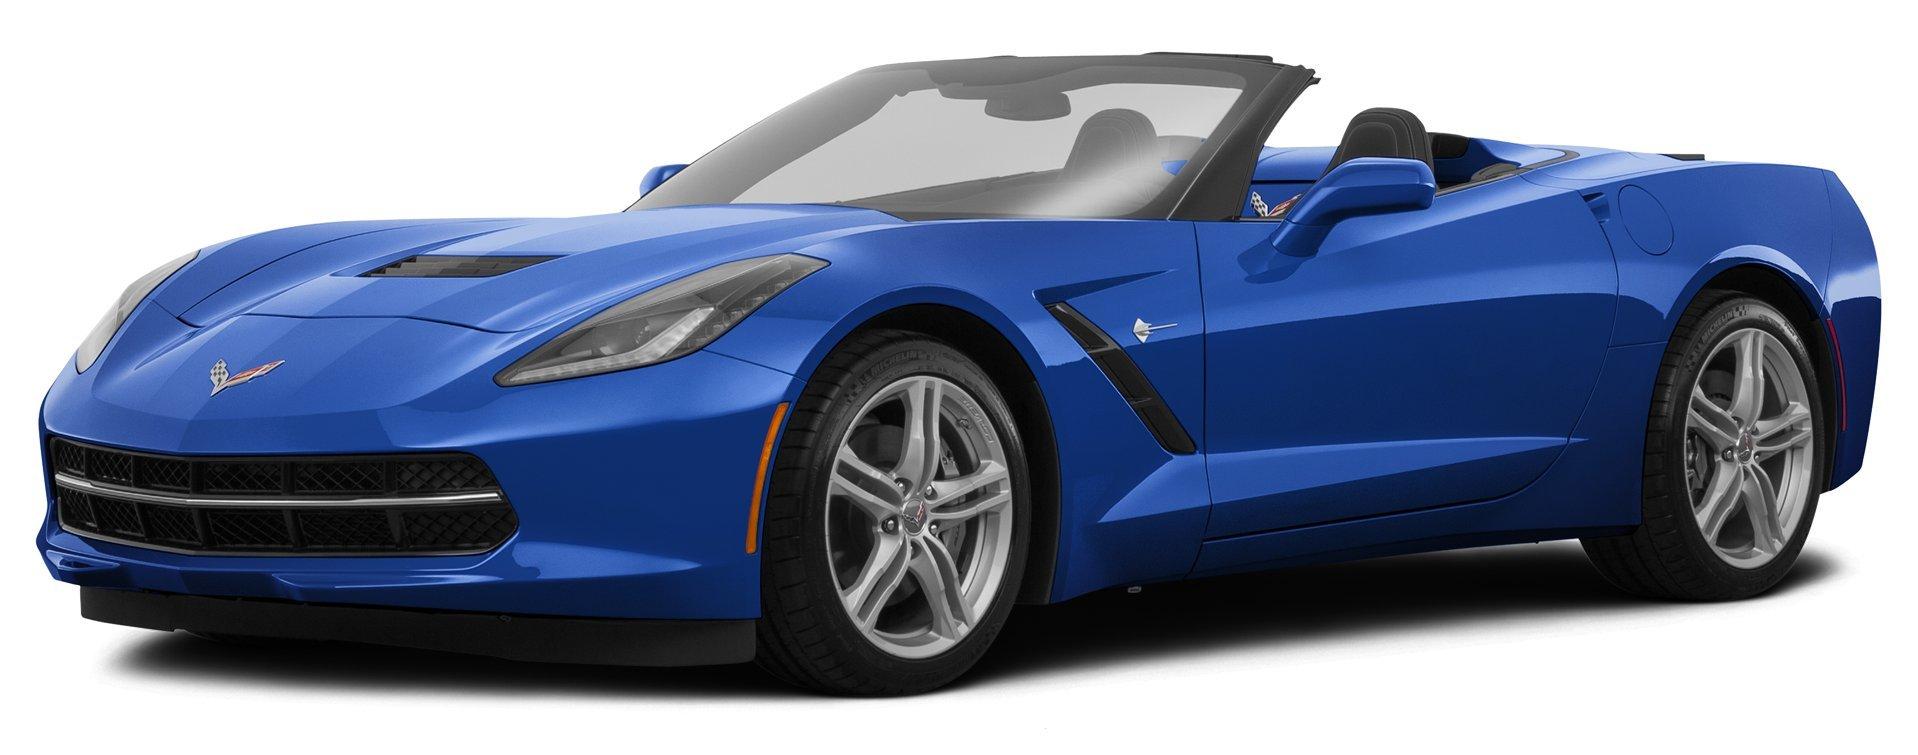 2016 Chevrolet Corvette 1LT, 2 Door Stingray Convertible ...